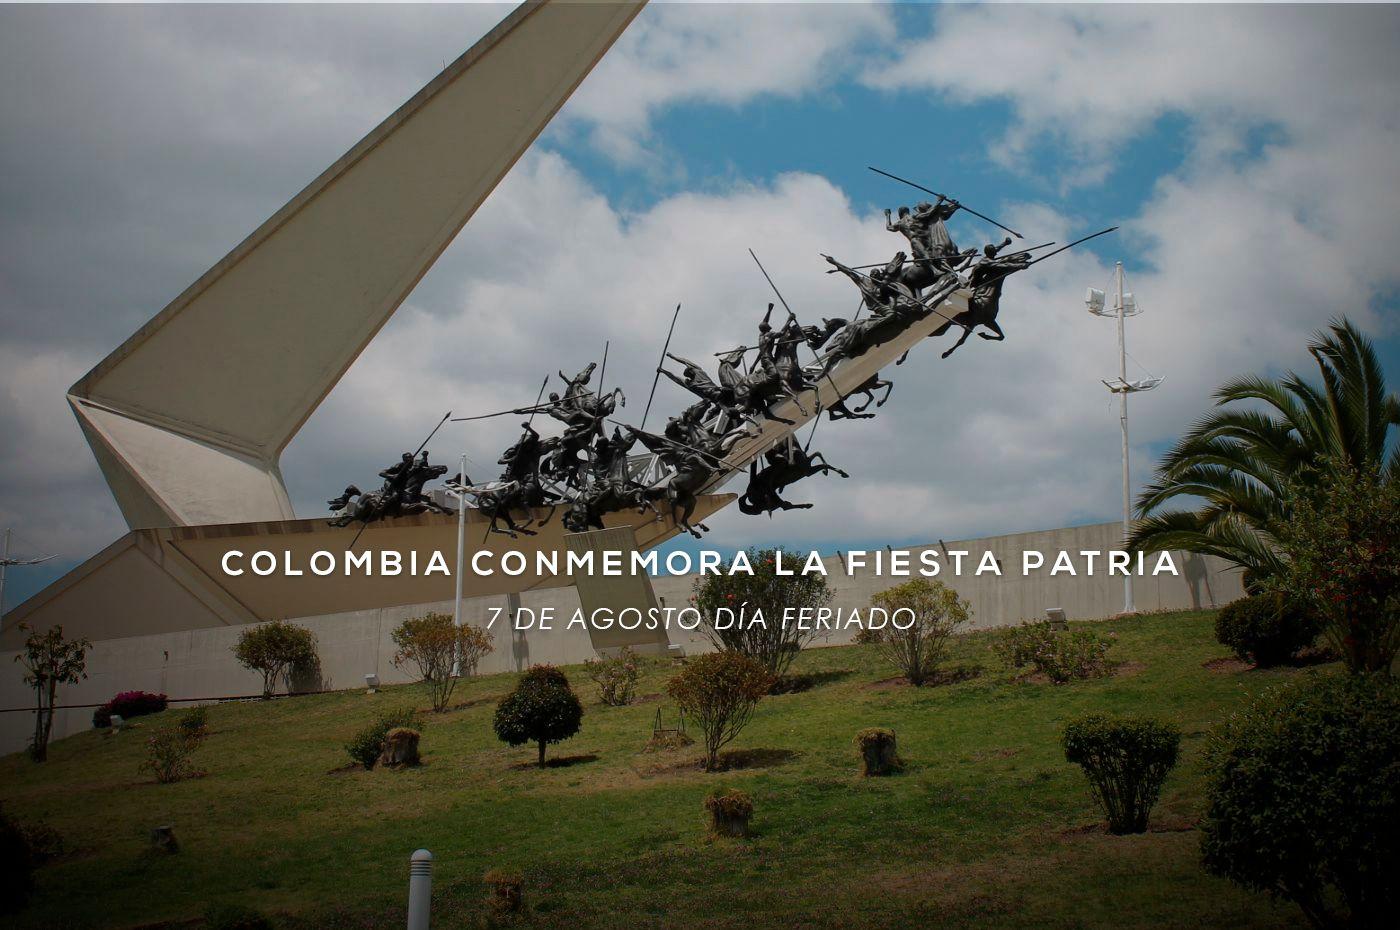 Colombia conmemora la fiesta patria